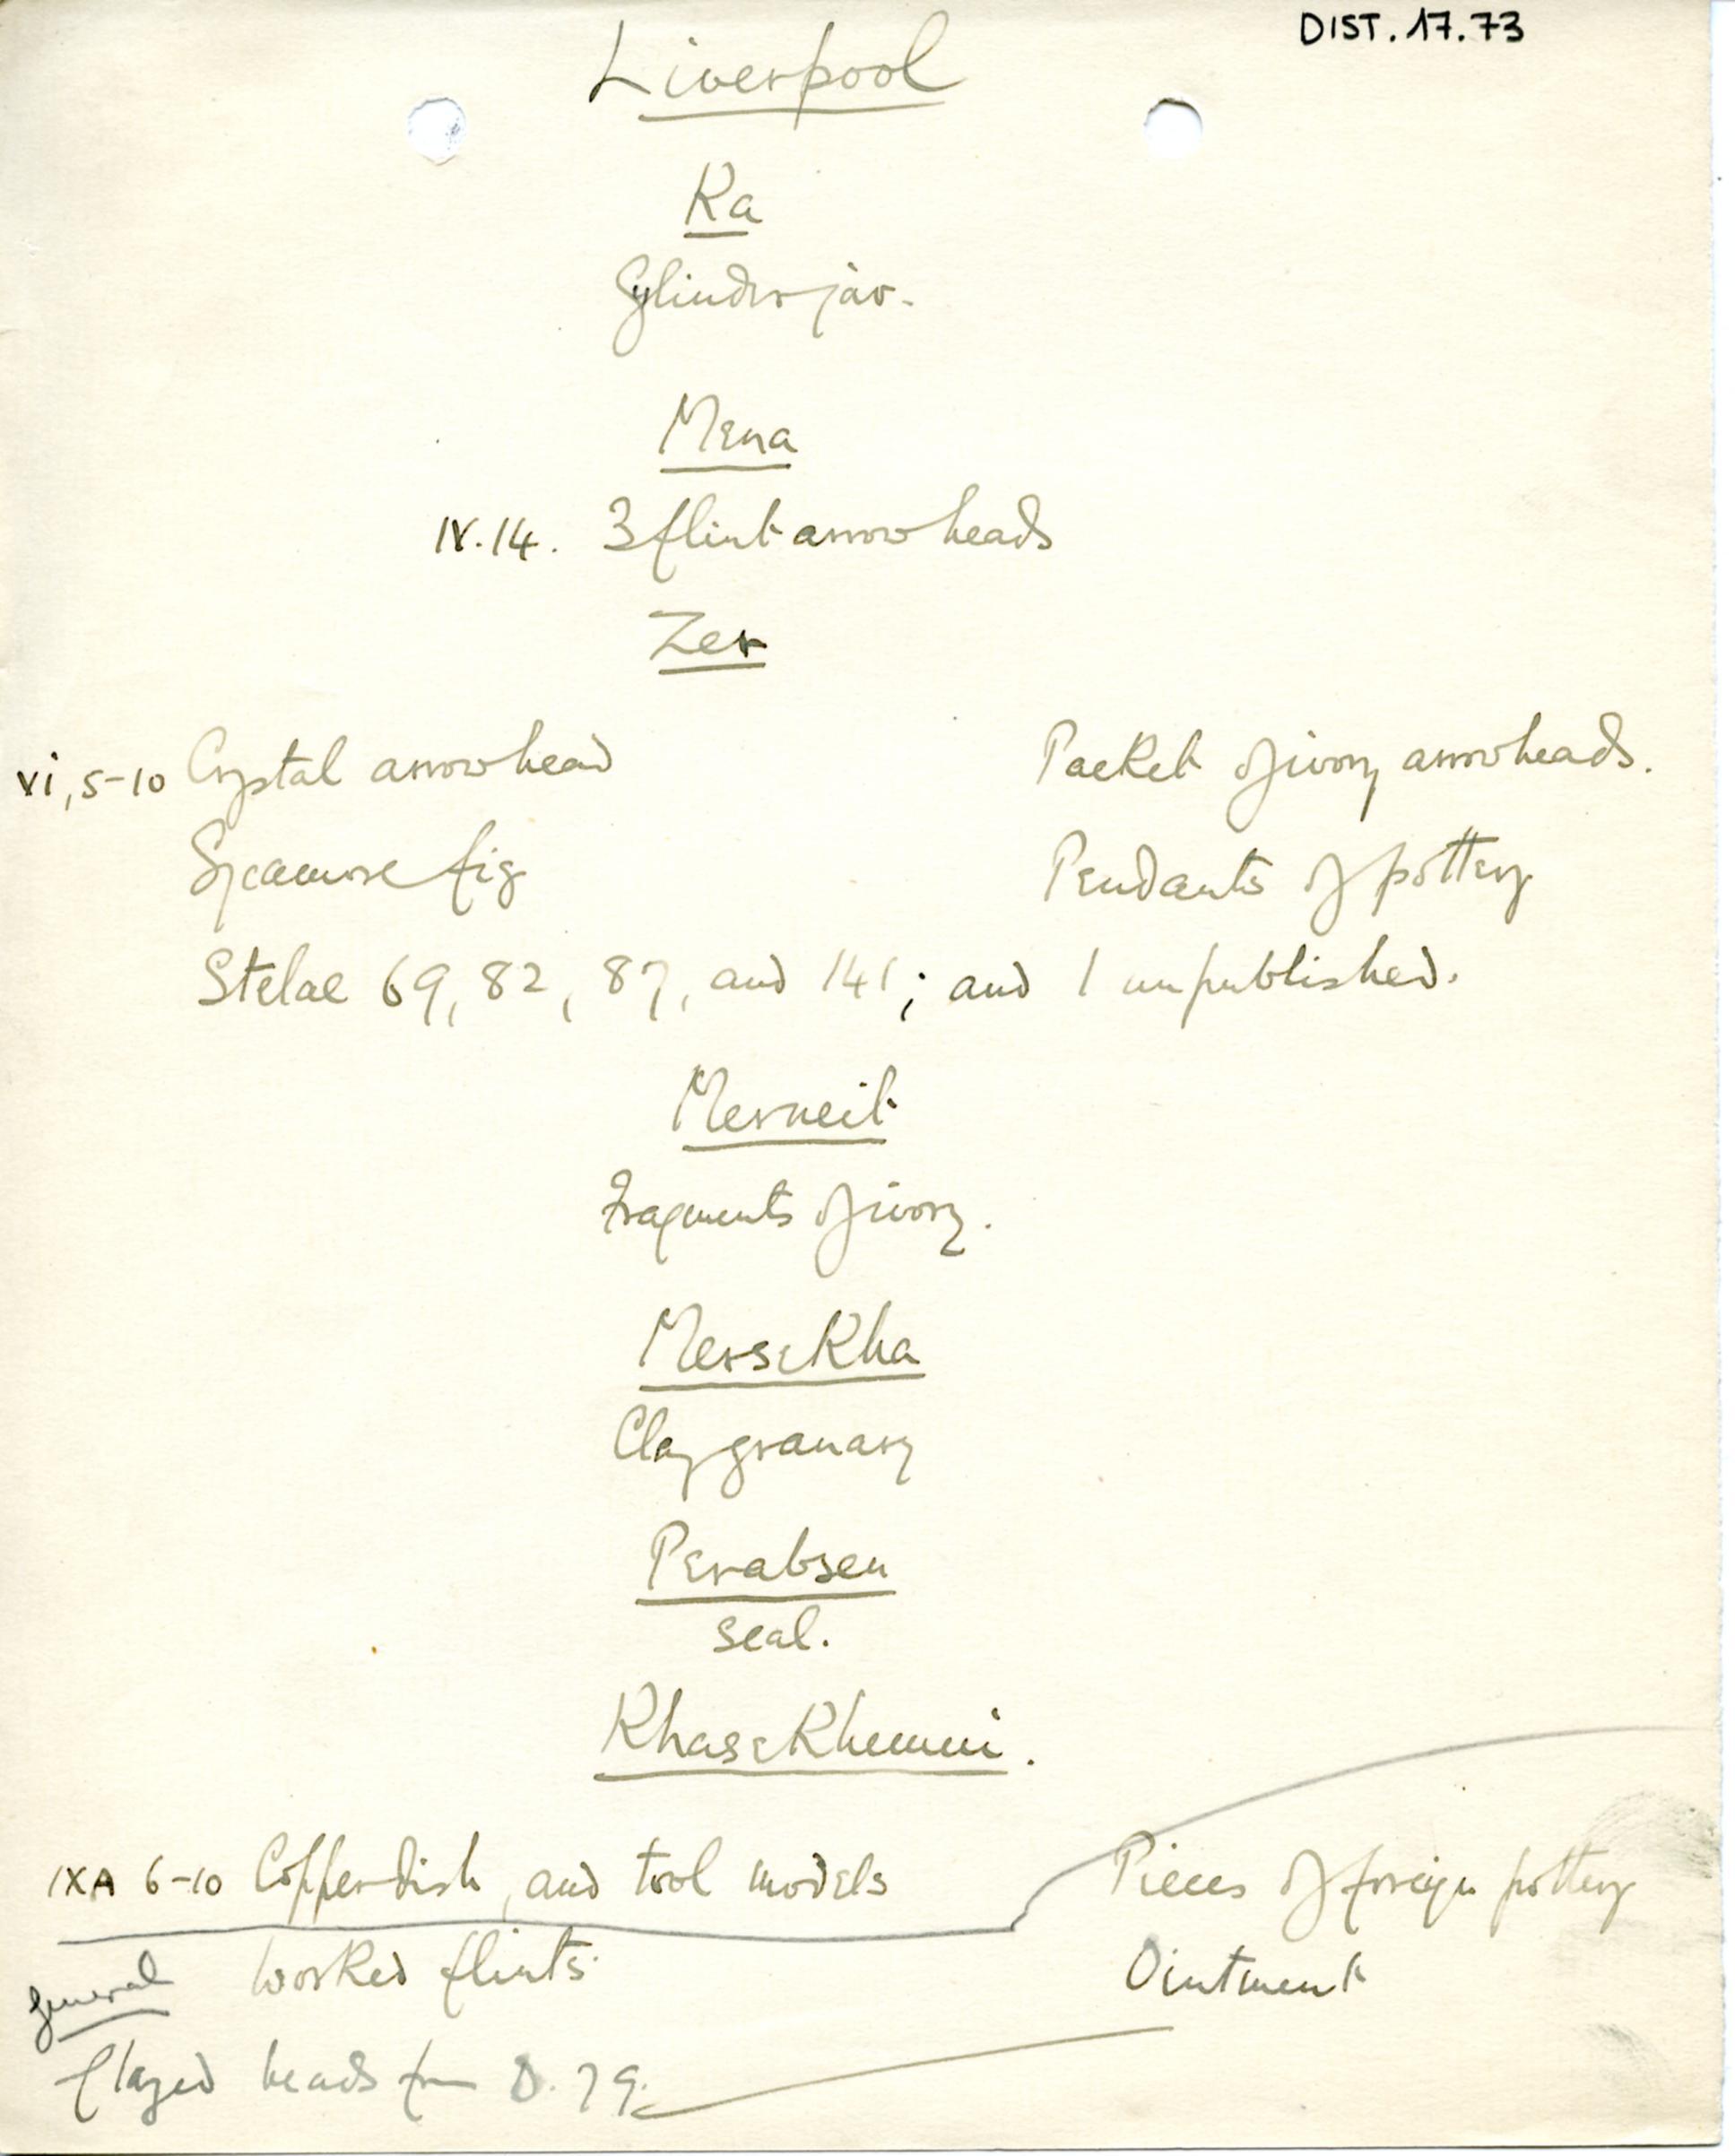 1898-1899 Hu, 1899-1900 Abydos DIST.17.73